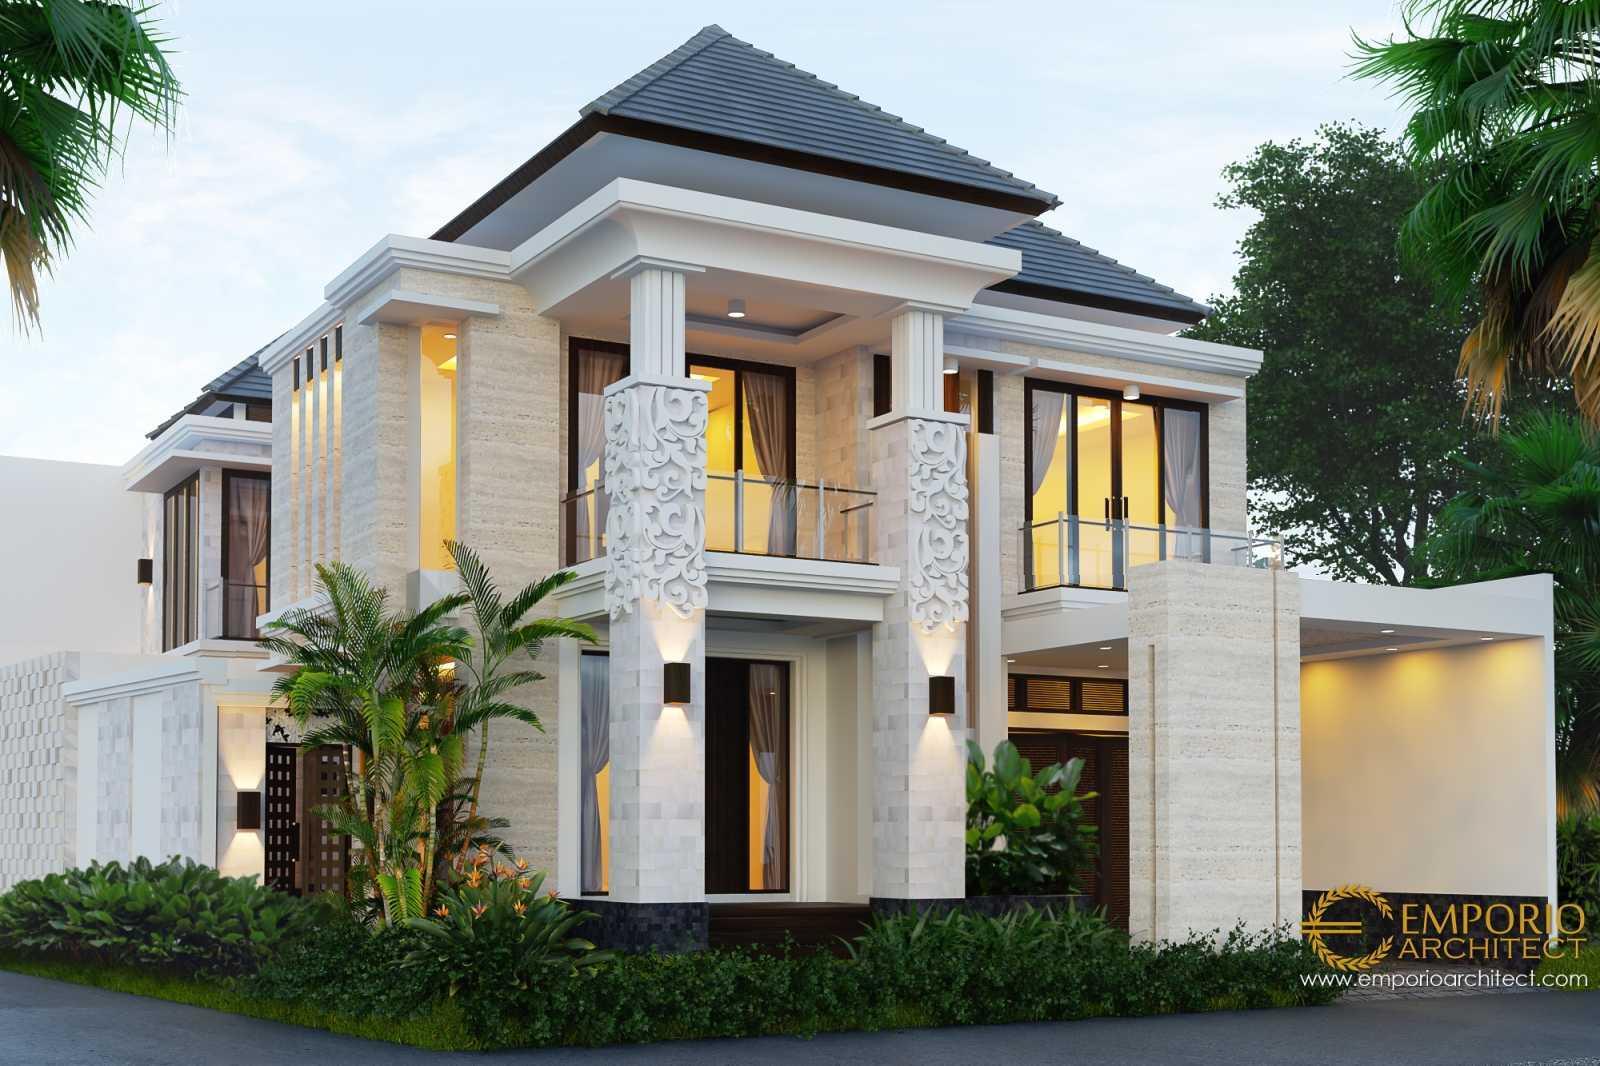 Emporio Architect Desain Rumah Villa Bali Tropis 447 @ Sanur, Bali Sanur, Kec. Denpasar Sel., Kota Denpasar, Bali, Indonesia Sanur, Kec. Denpasar Sel., Kota Denpasar, Bali, Indonesia Emporio-Architect-Desain-Rumah-Villa-Bali-Tropis-447-Sanur-Bali Tropical  77847